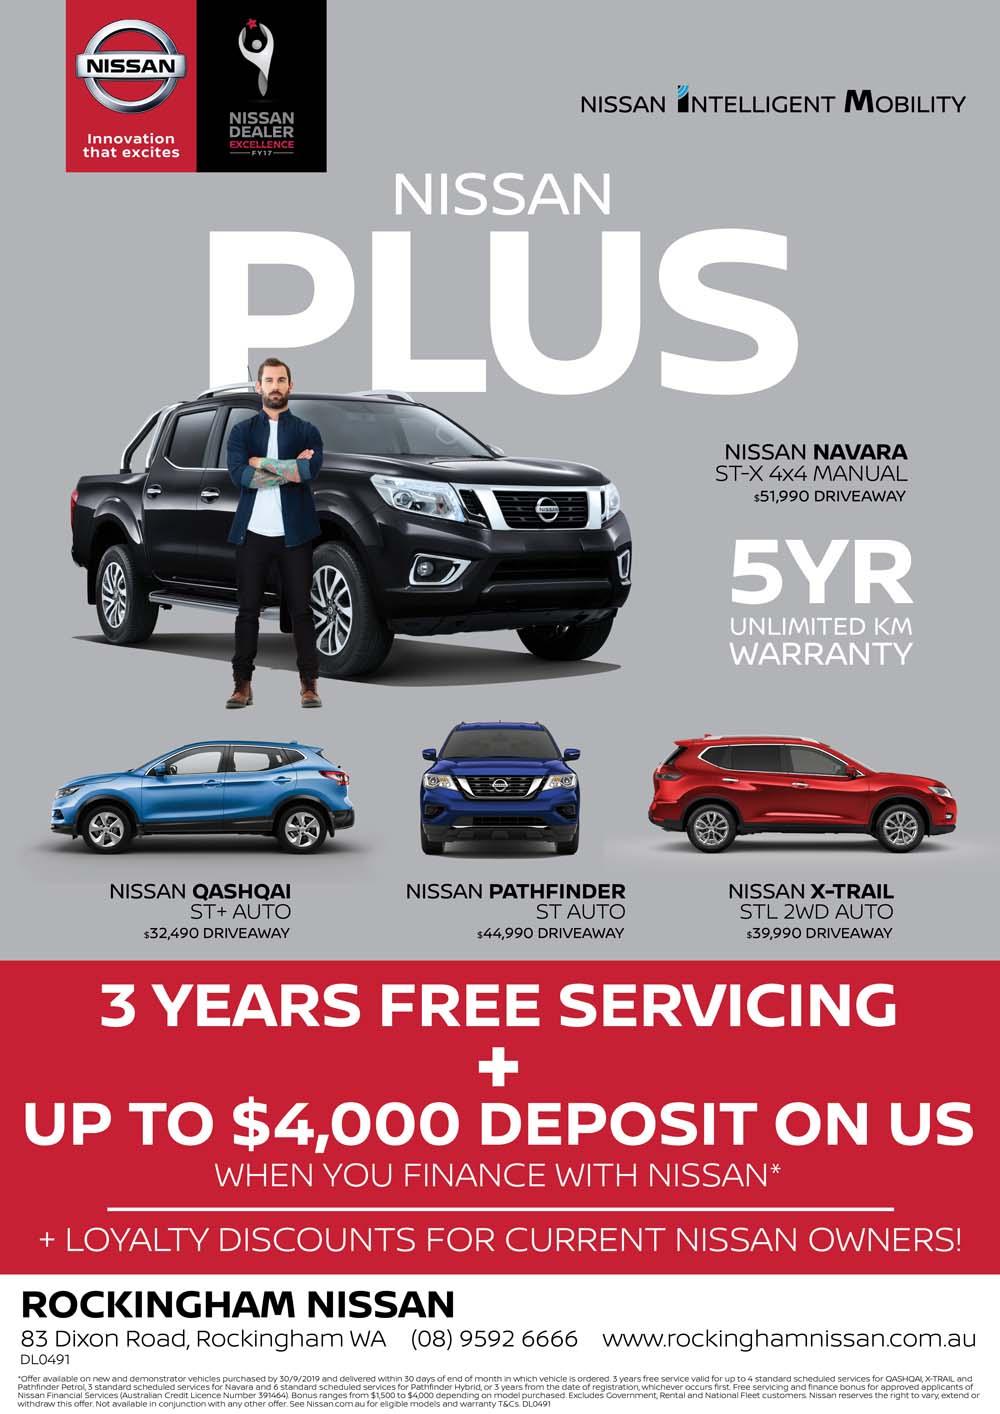 Nissan Plus